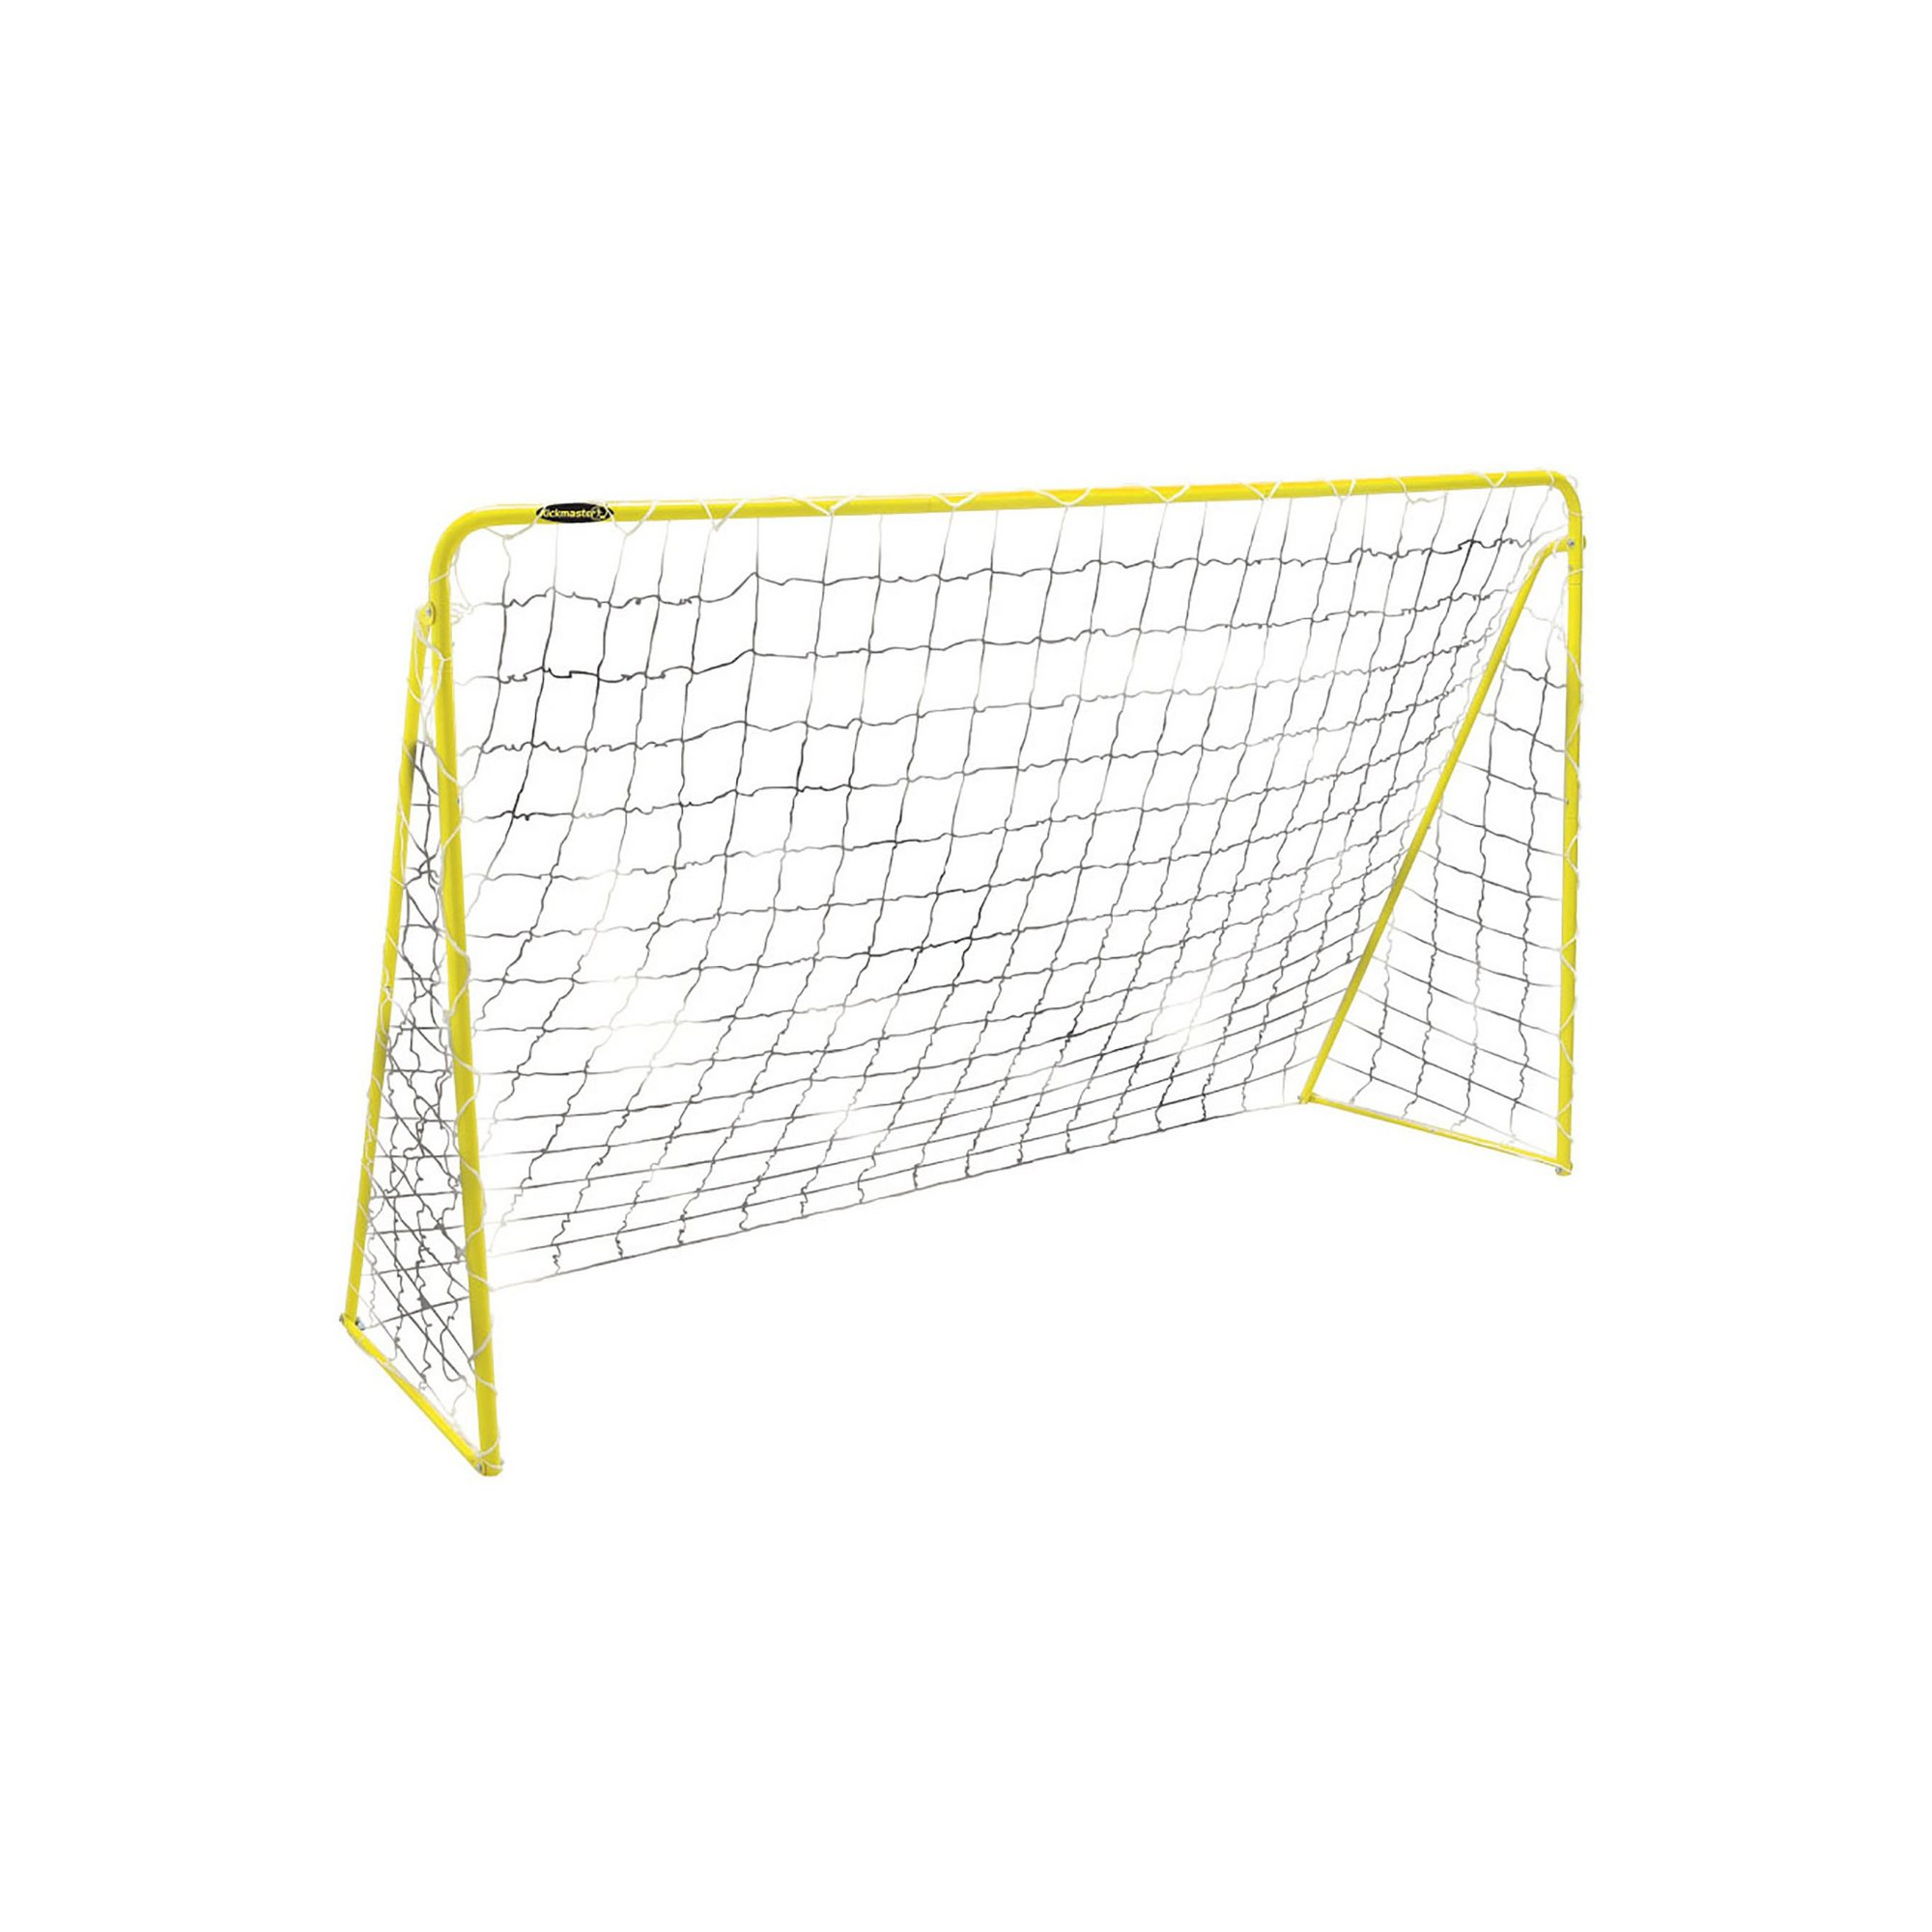 Image of Kickmaster Premier Football Goal 8ft